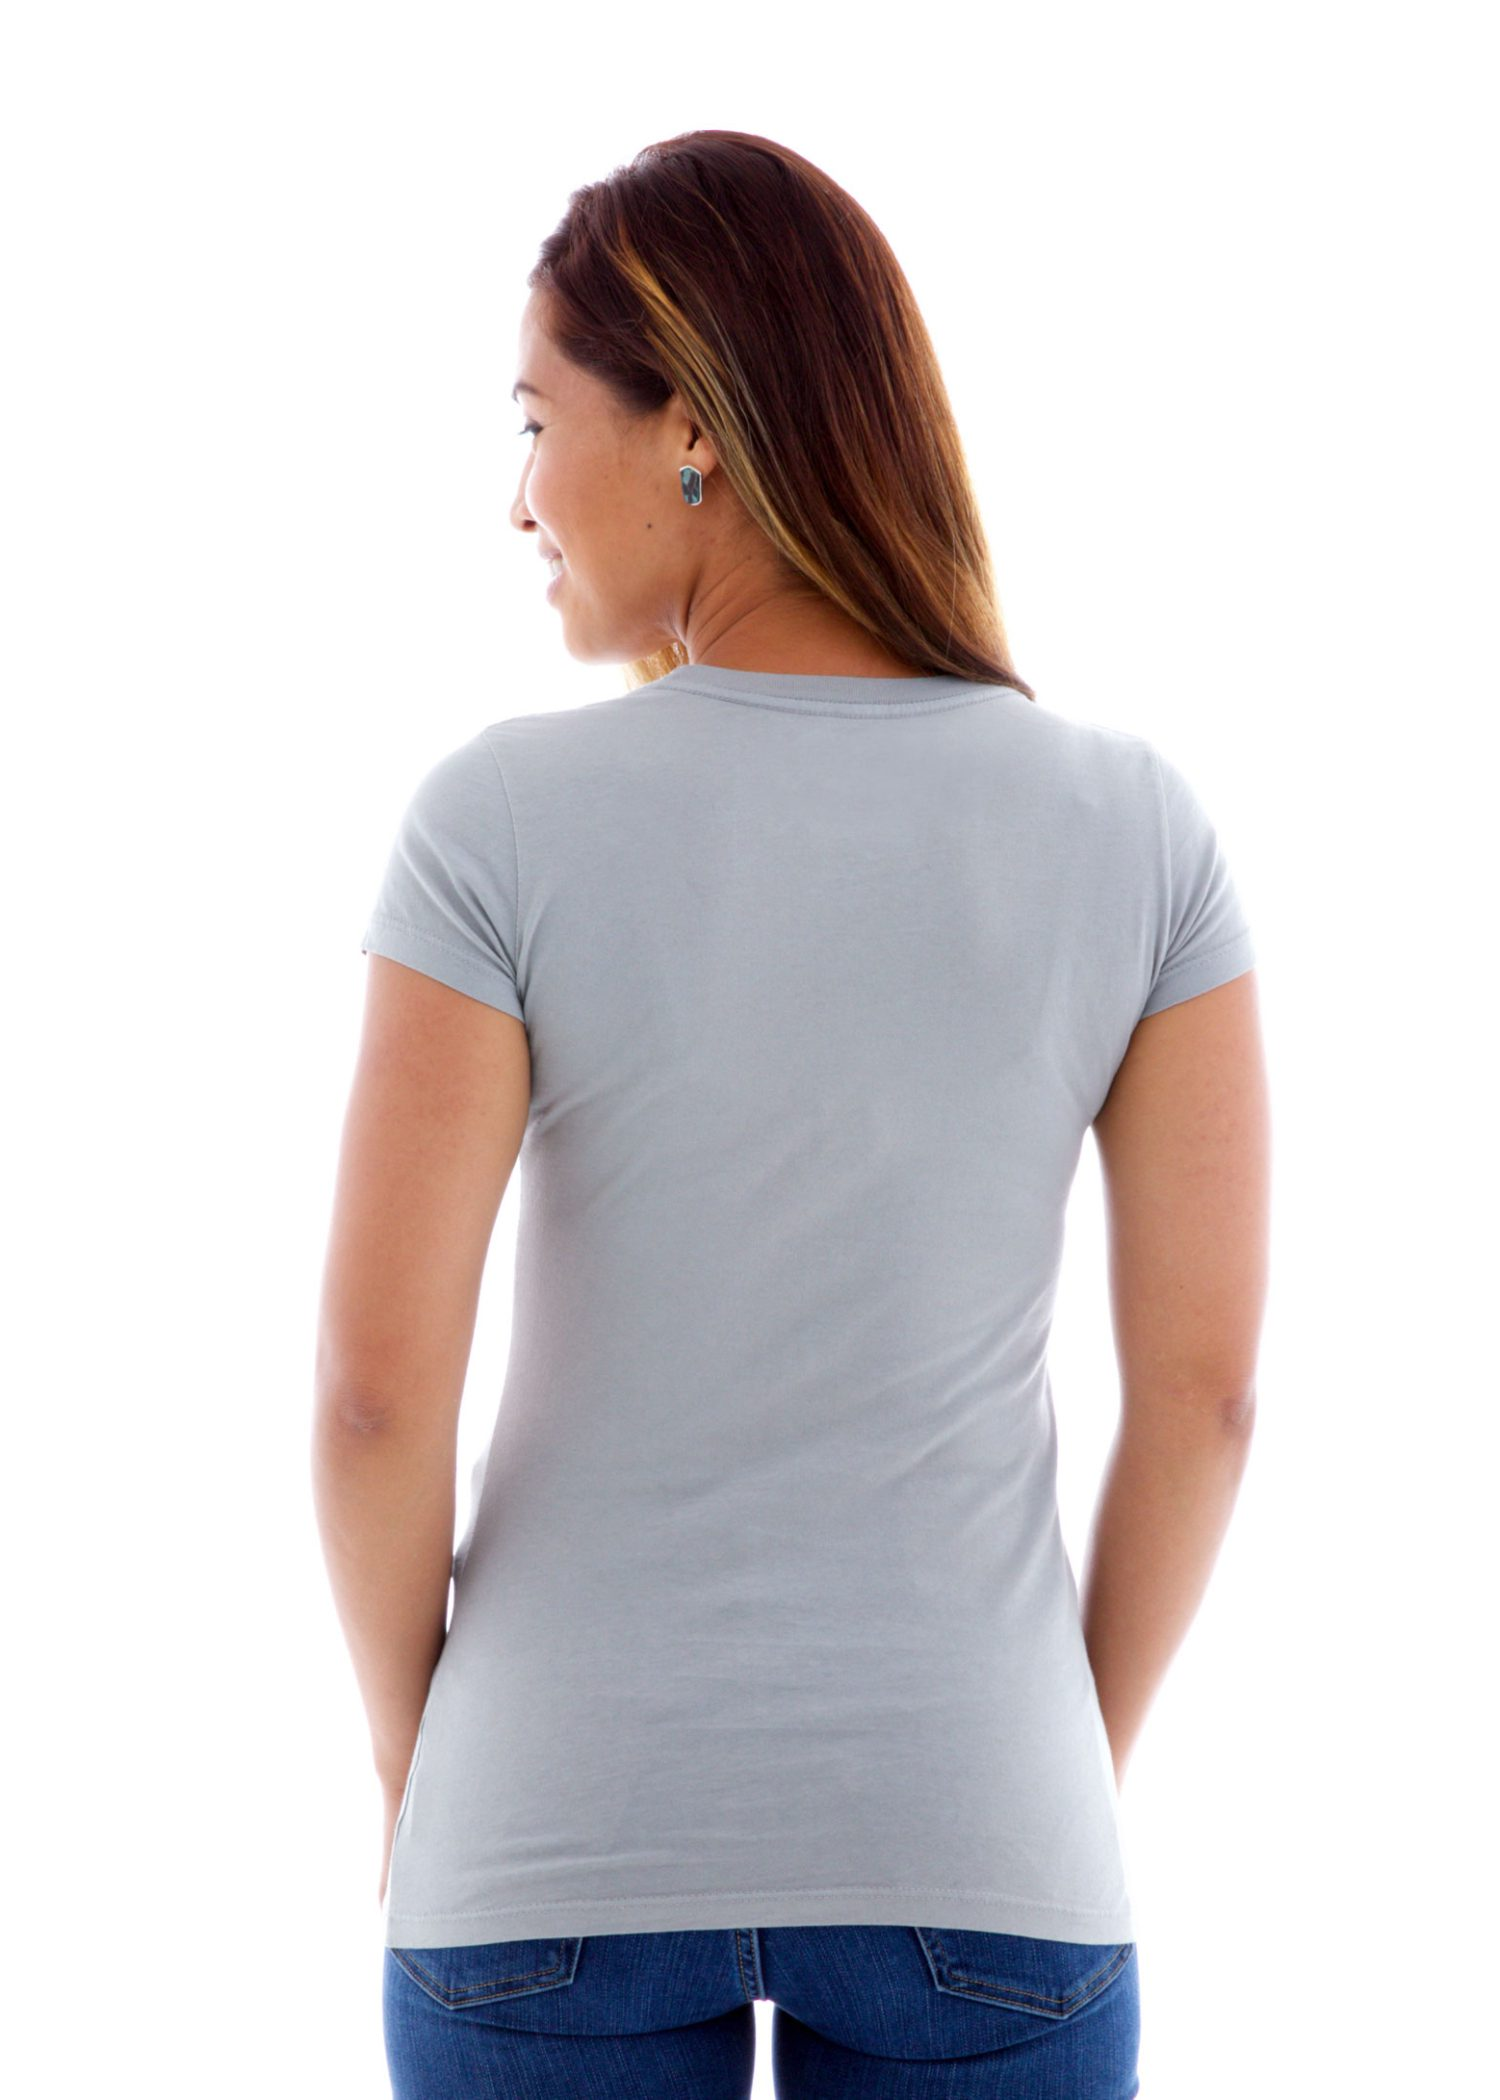 Fine Jersey Crew Short Sleeve T-Shirt Back View